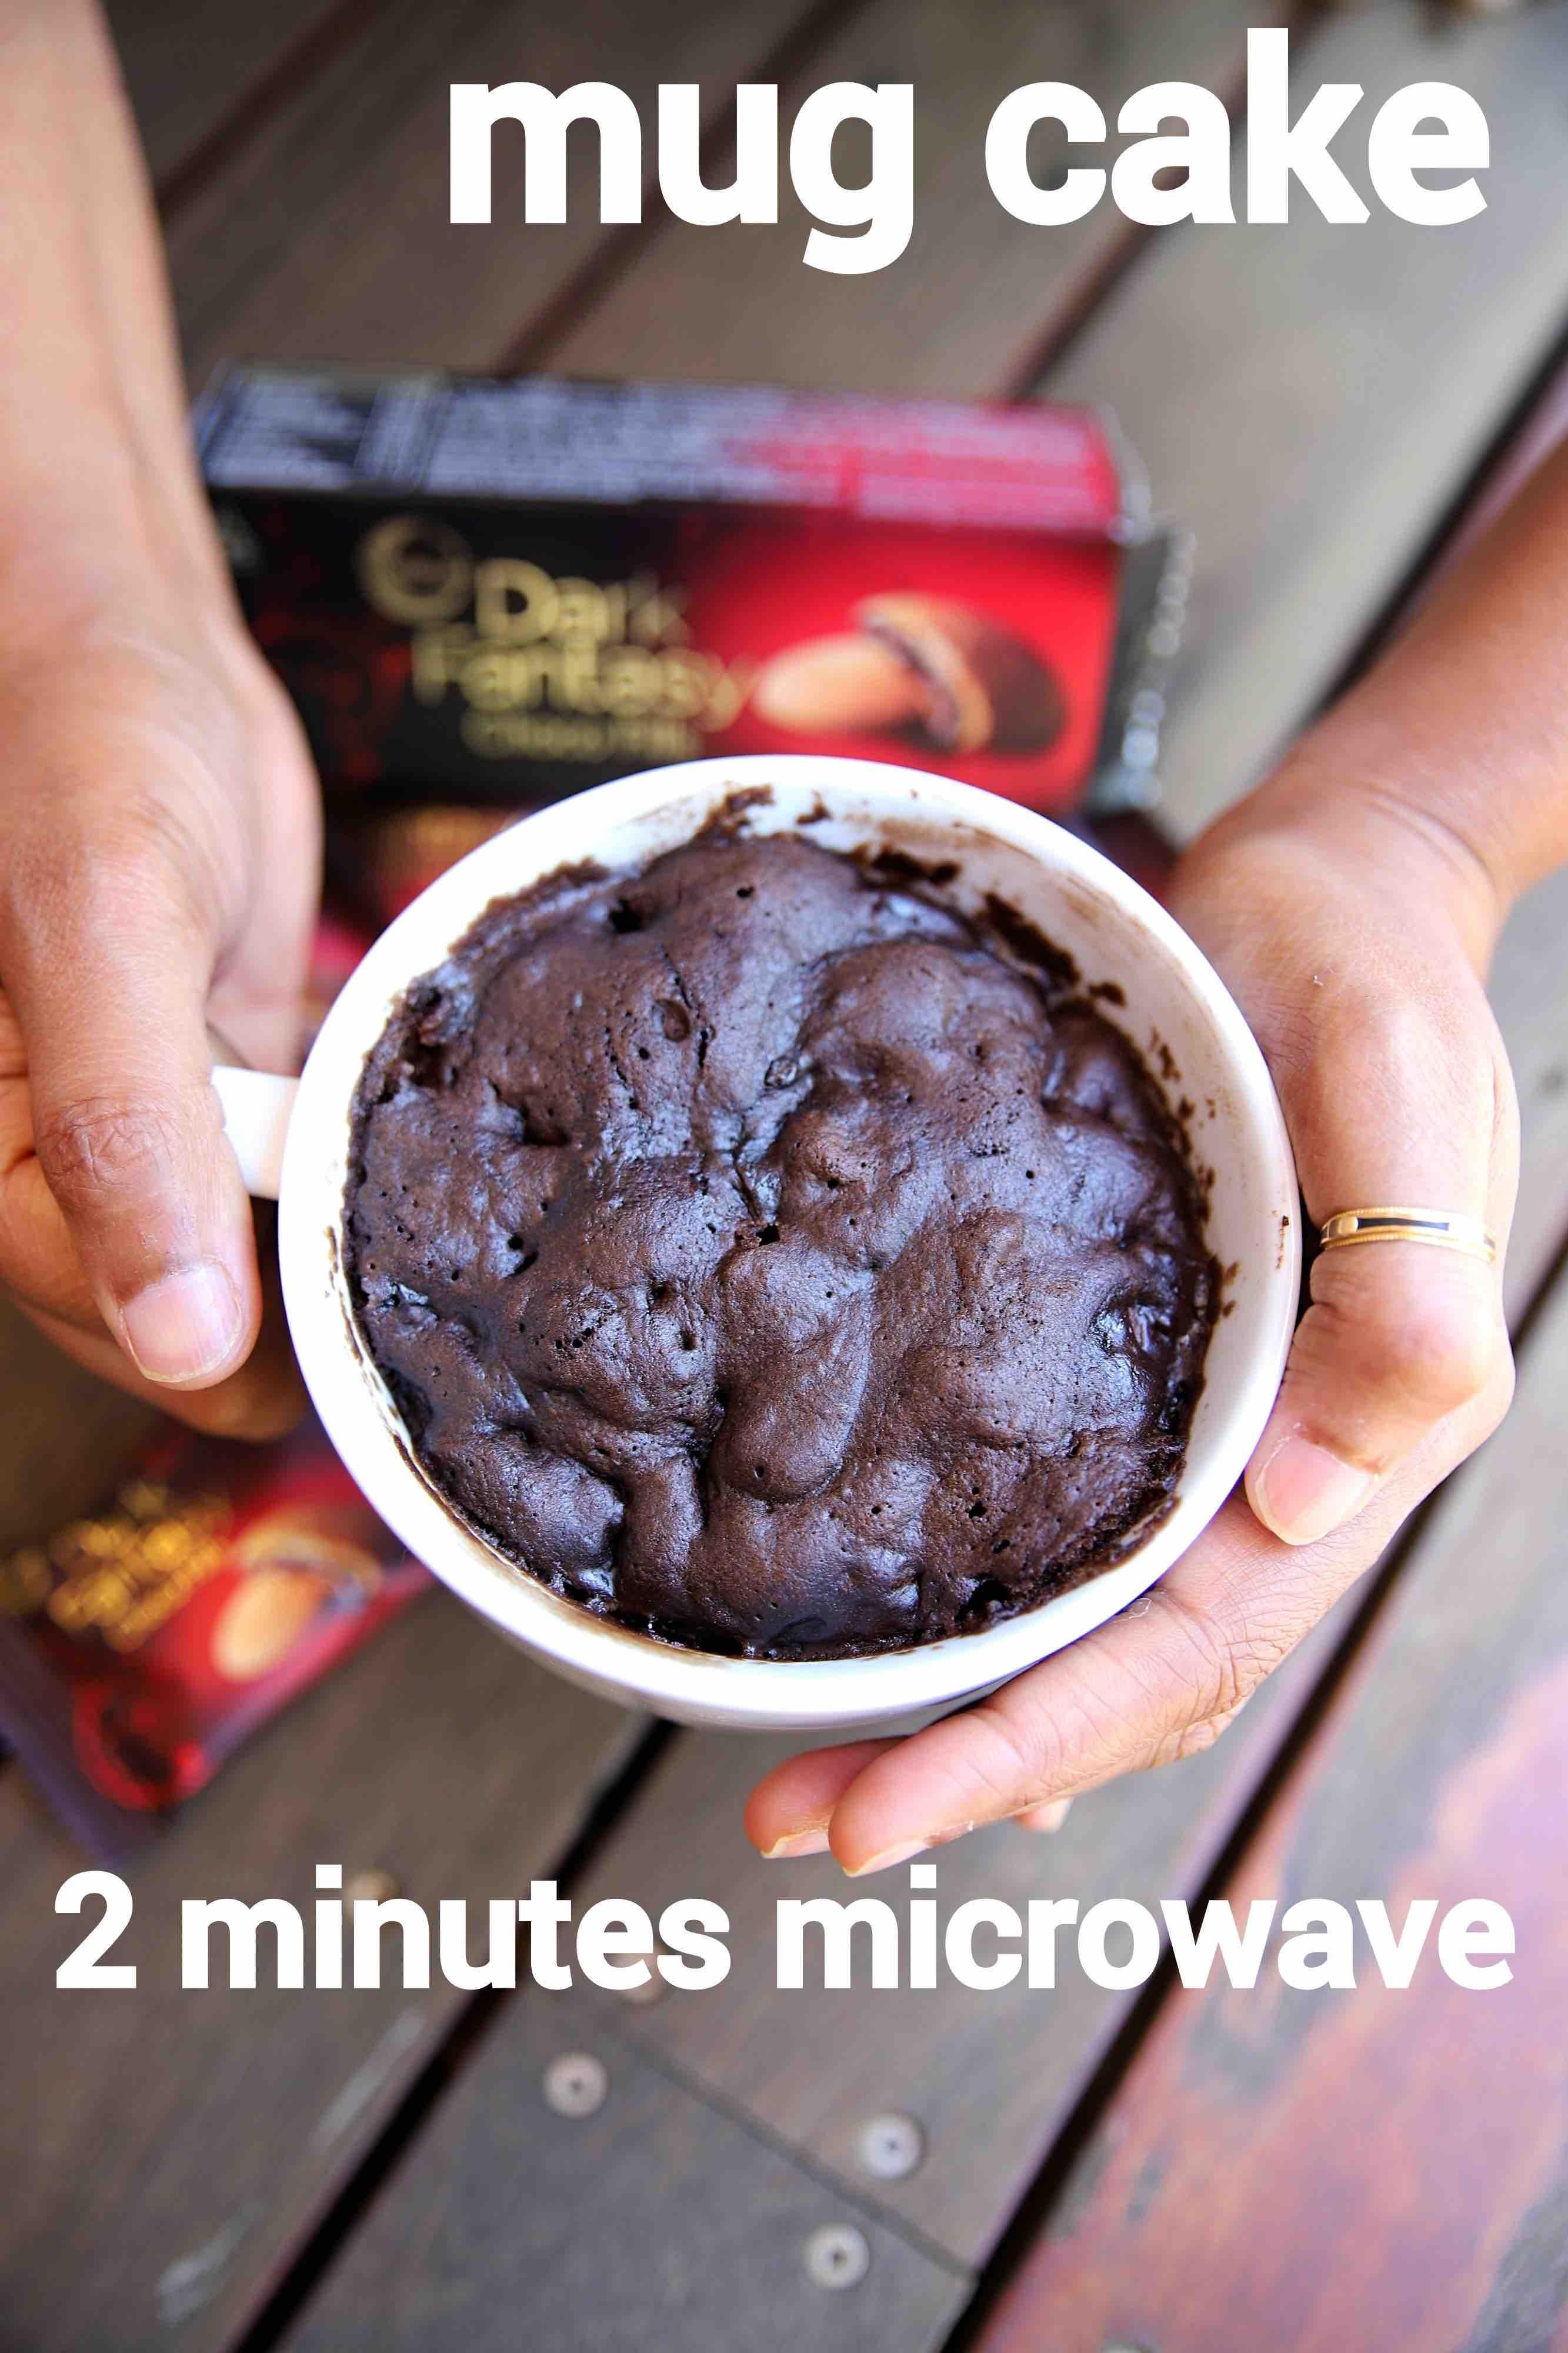 mug cake microwave cake recipe brownie red velvet mug cake